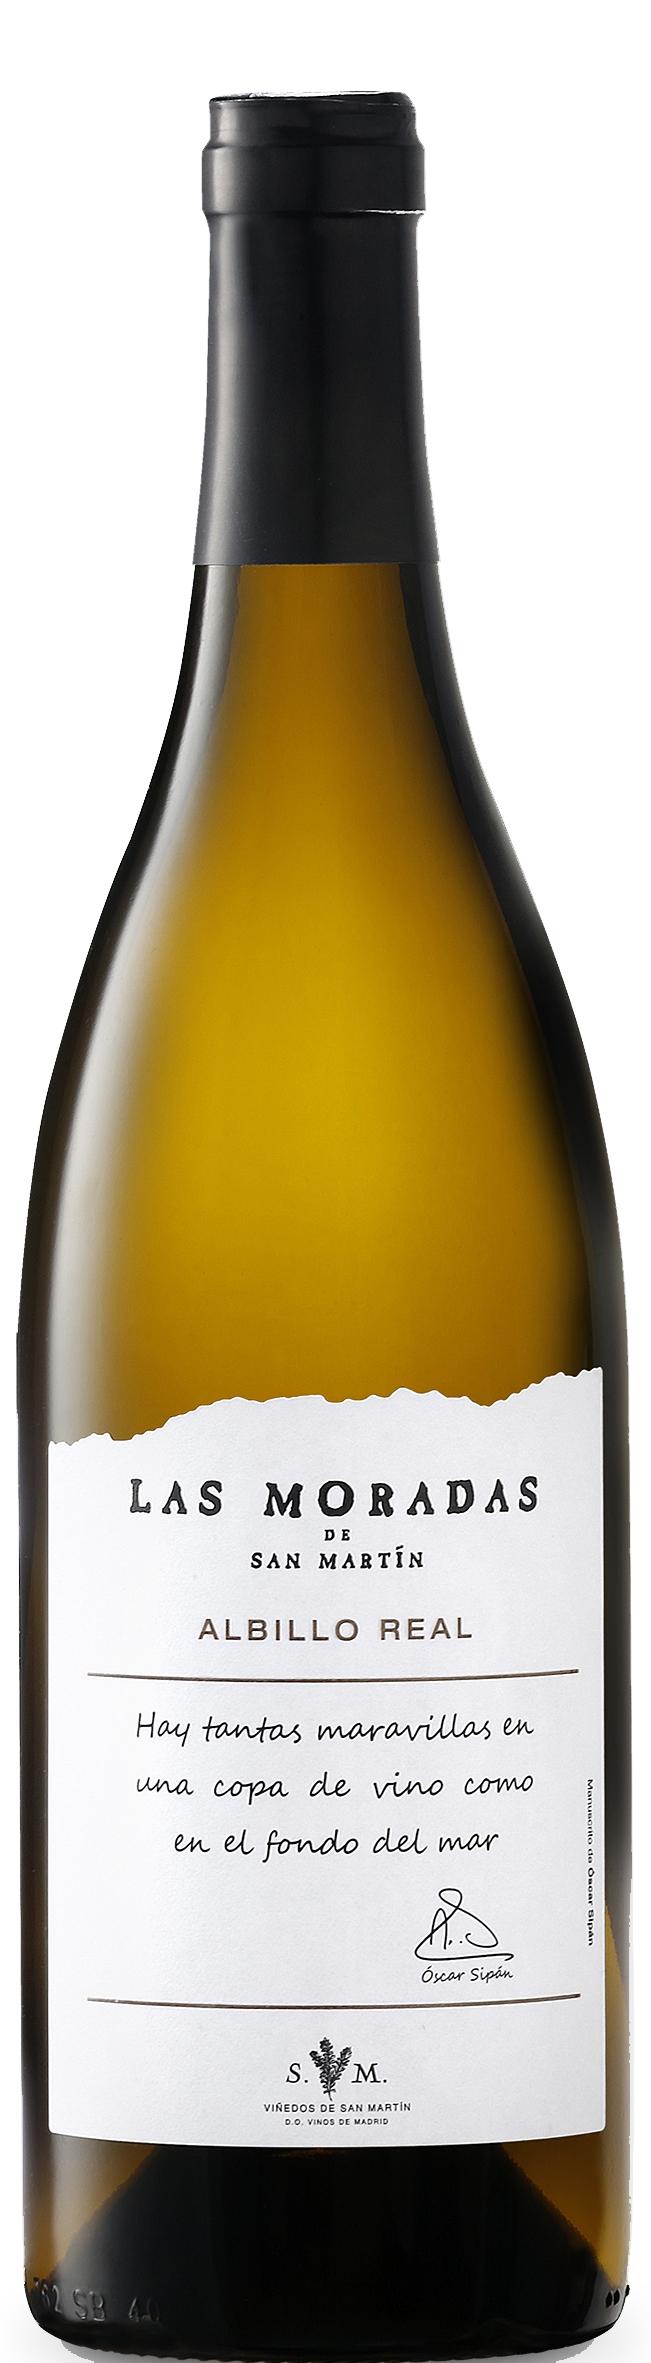 LAS MORADAS - ALBILLO REAL 2016